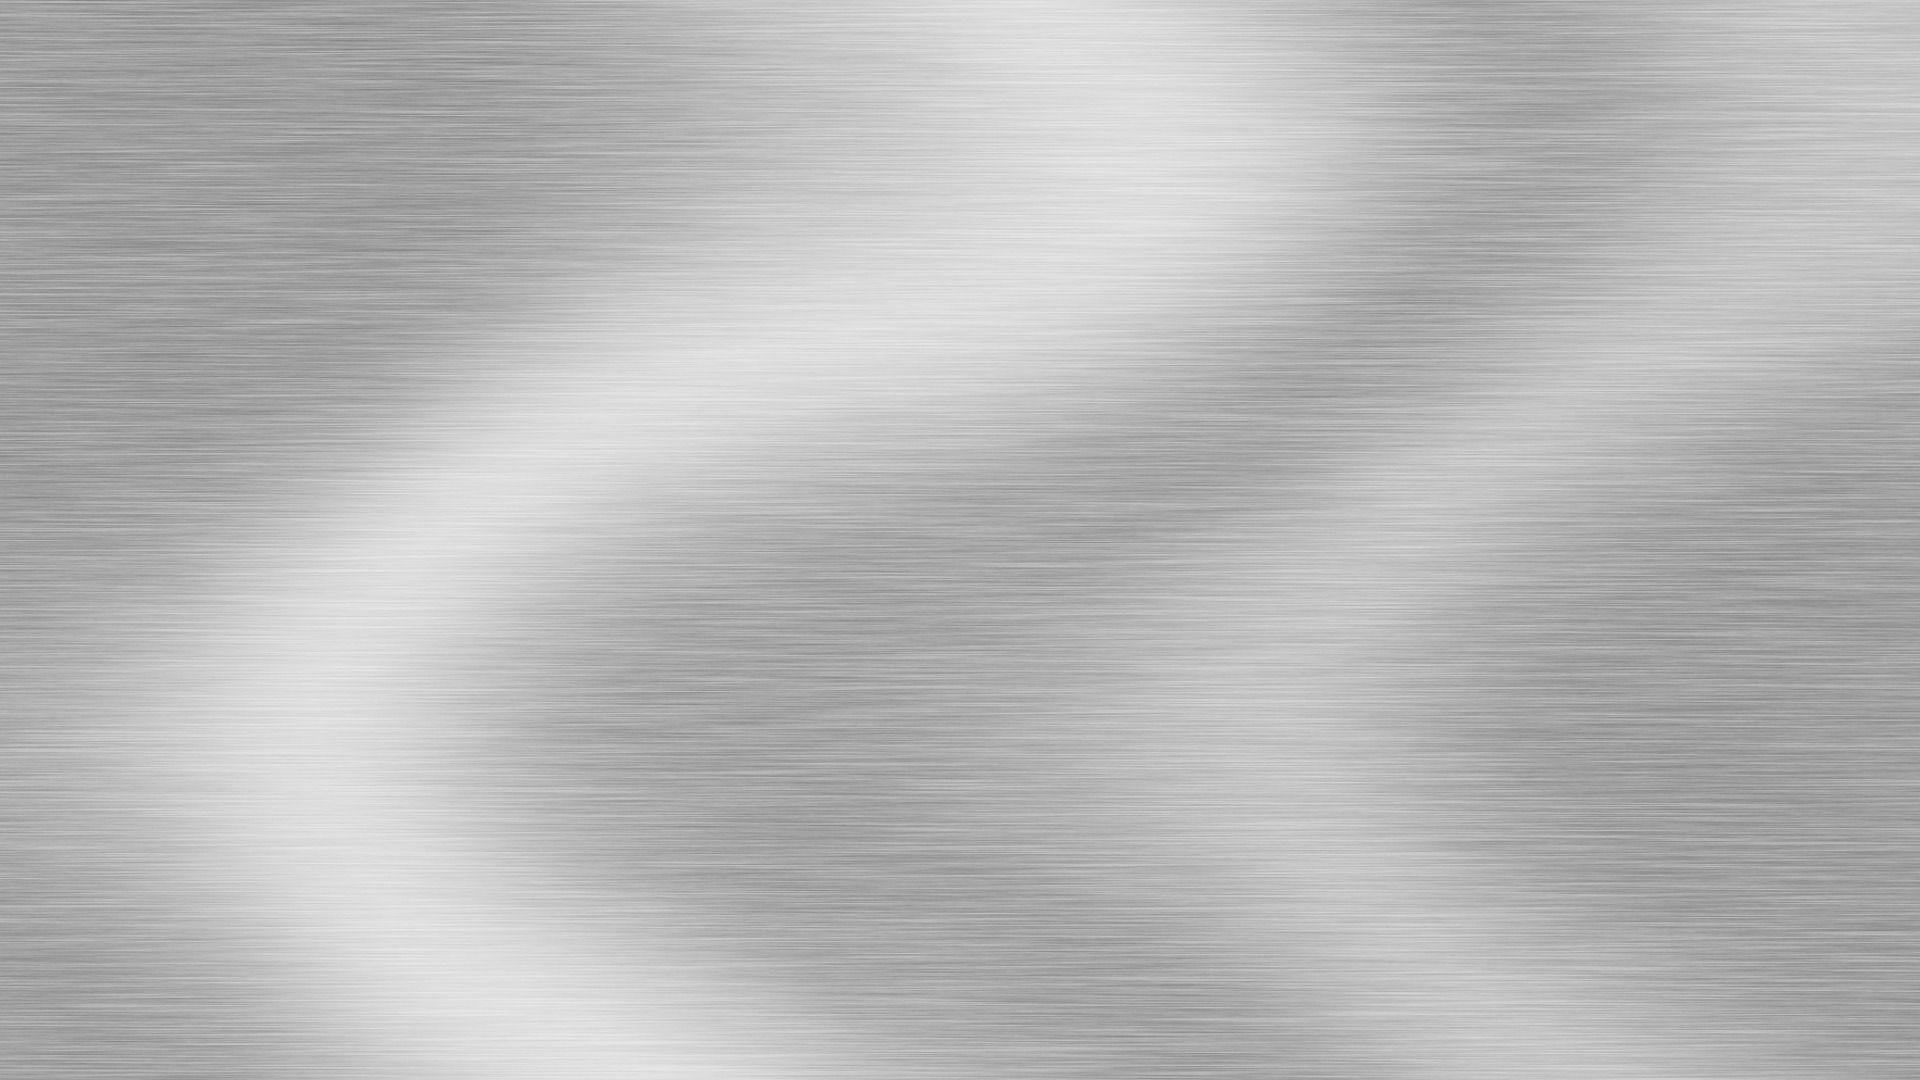 Silver download wallpaper image